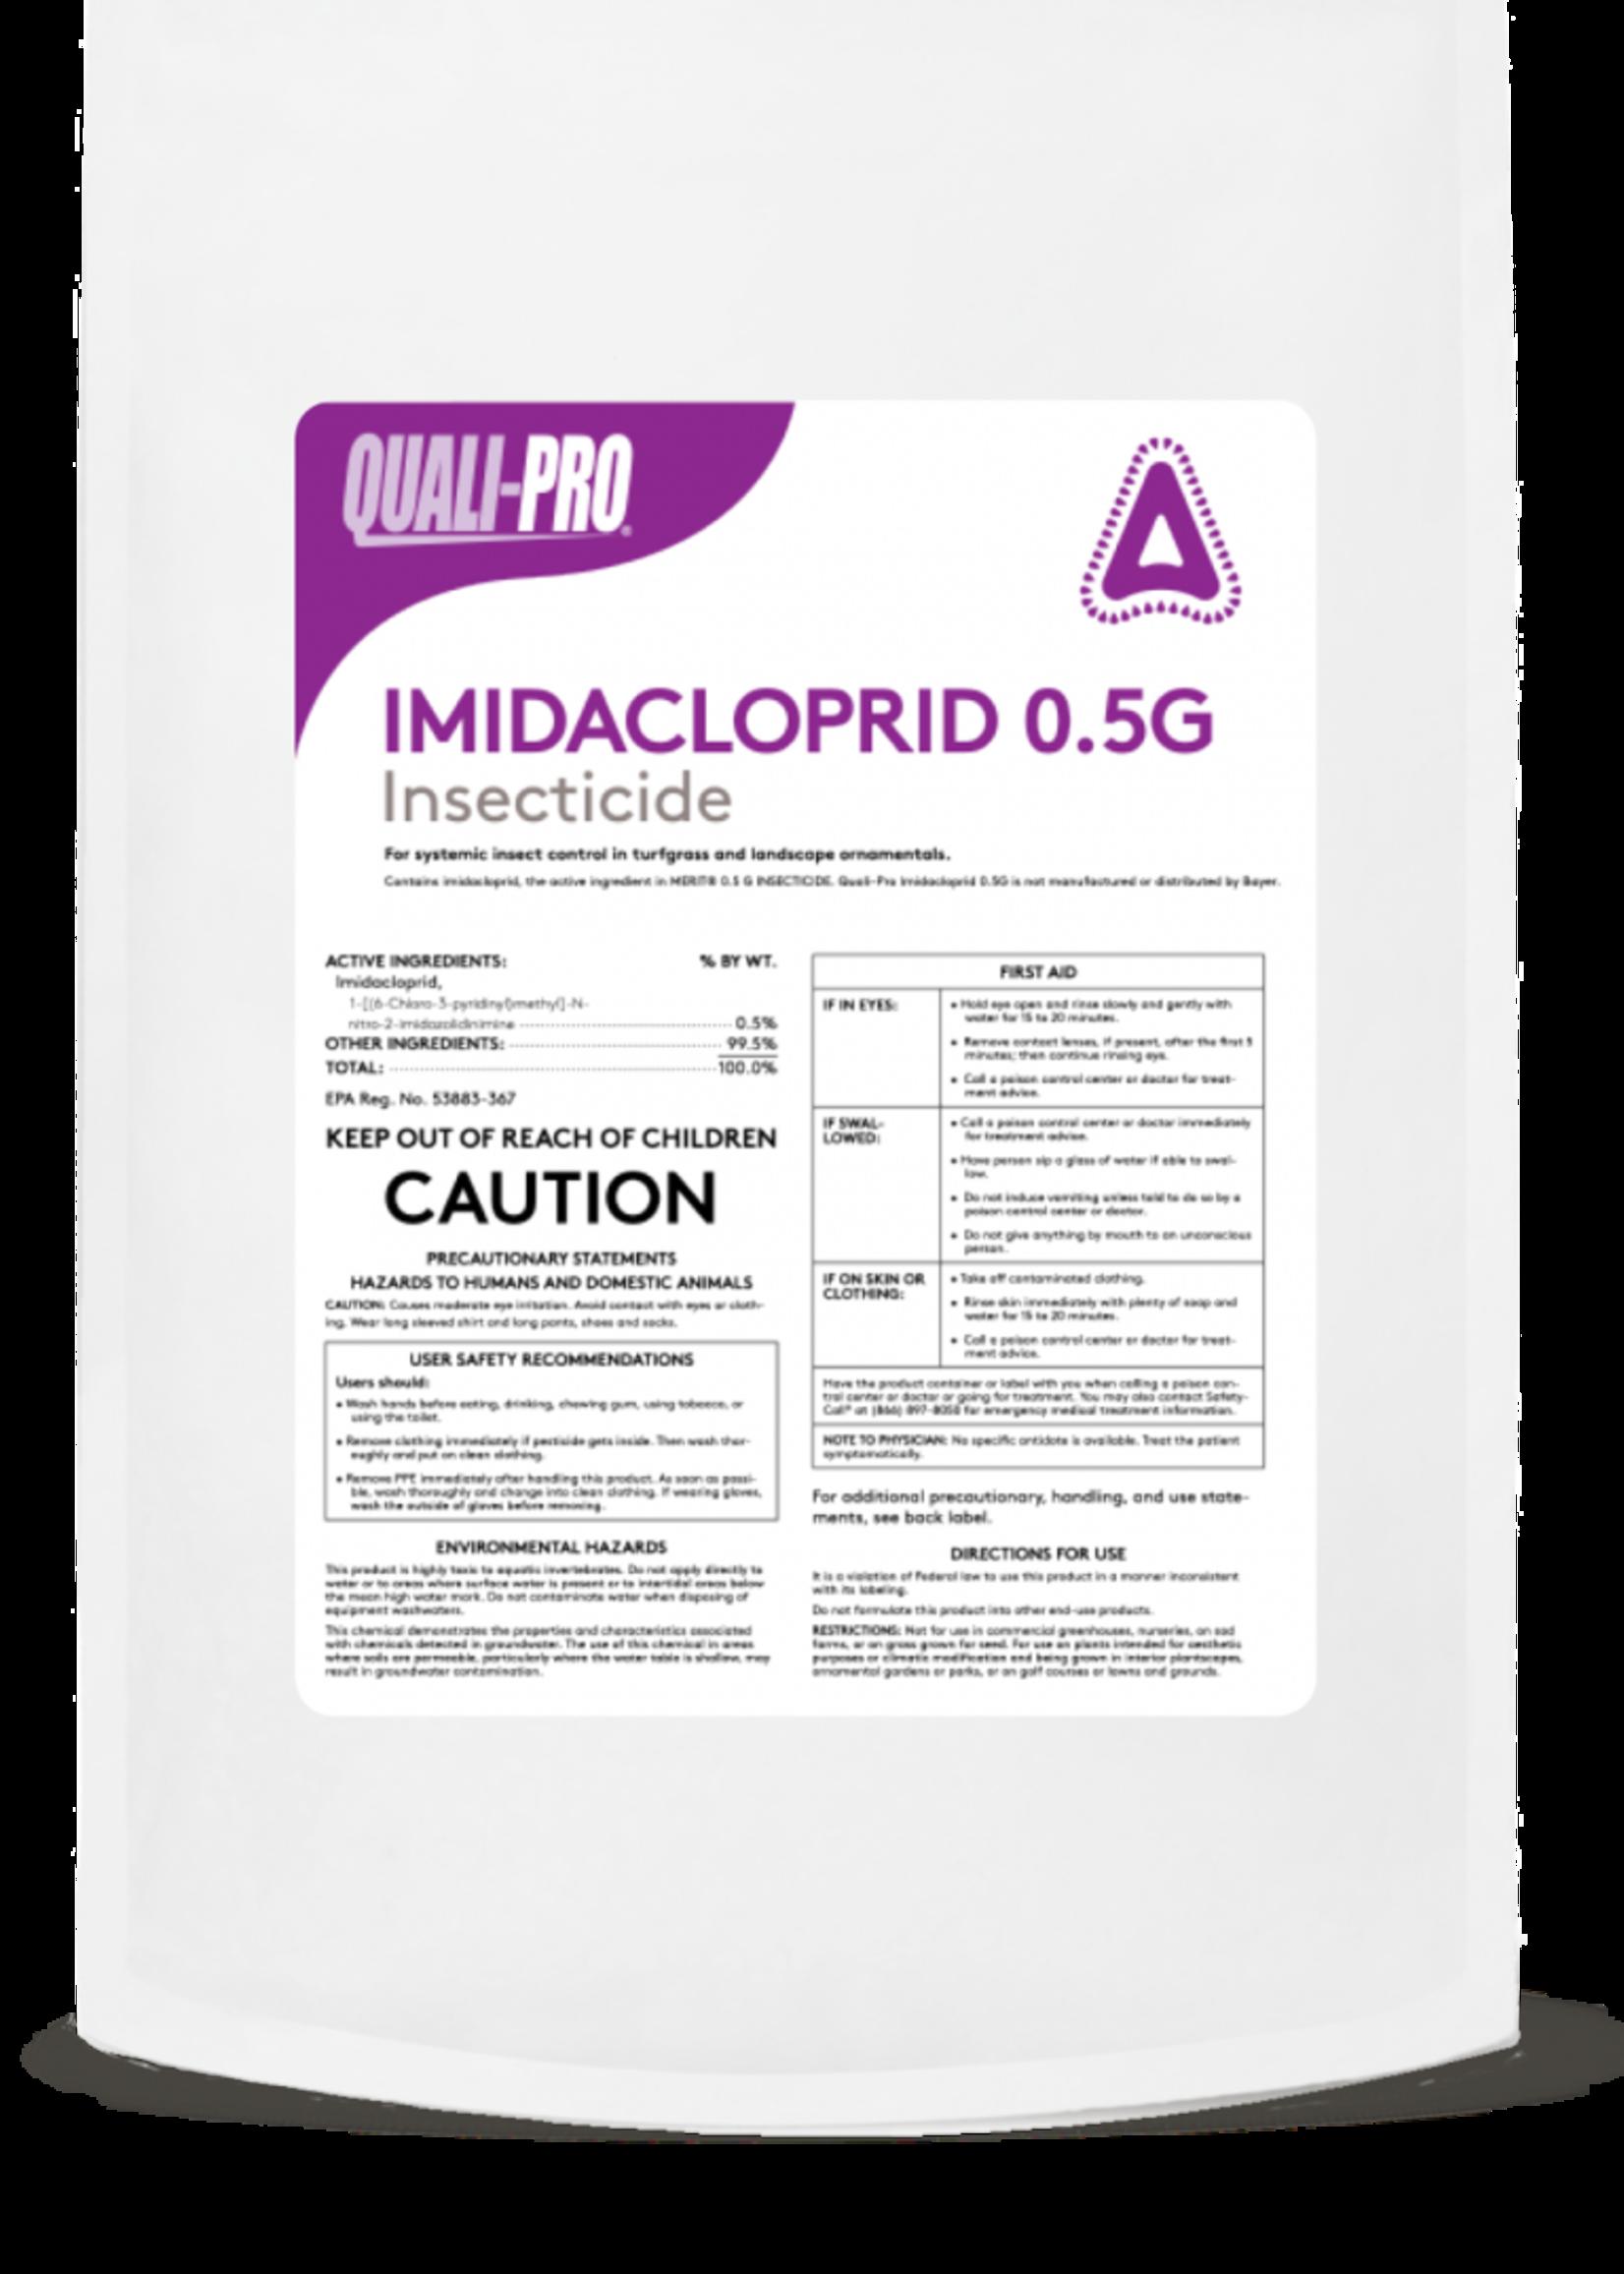 QualiPro Imidicloprid (Merit) .5G 30#